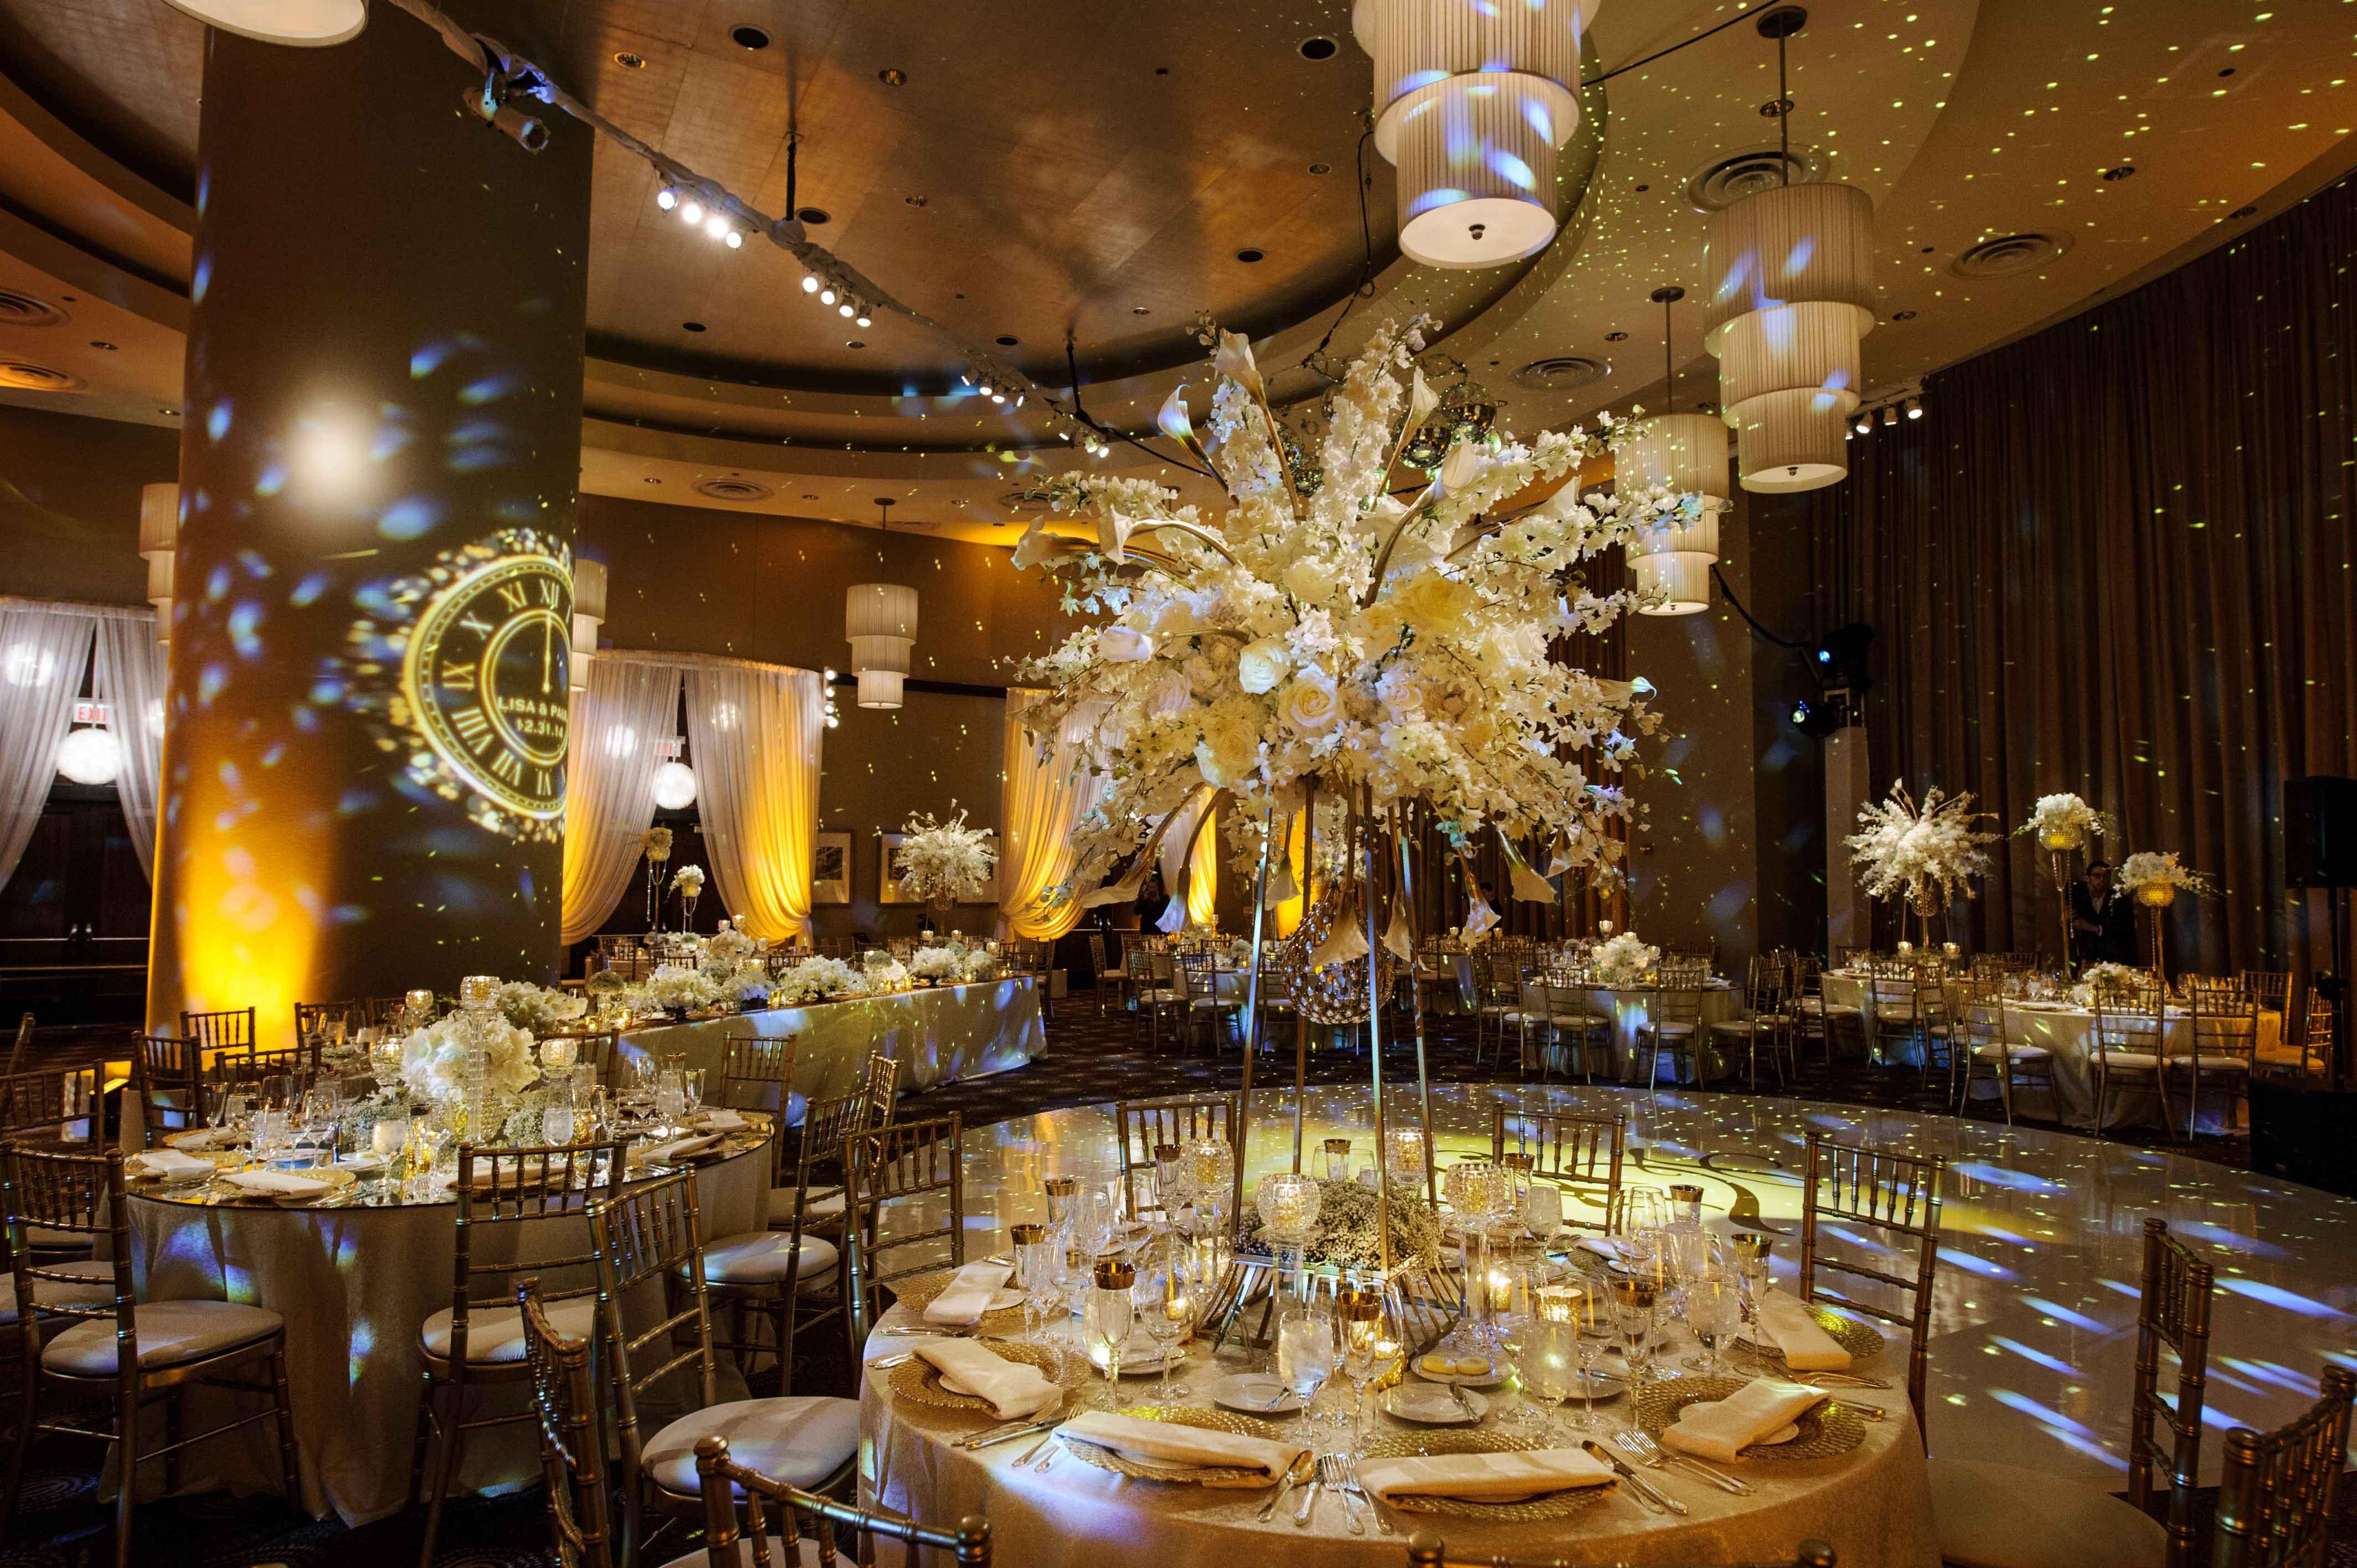 New Year's Eve ballroom wedding reception